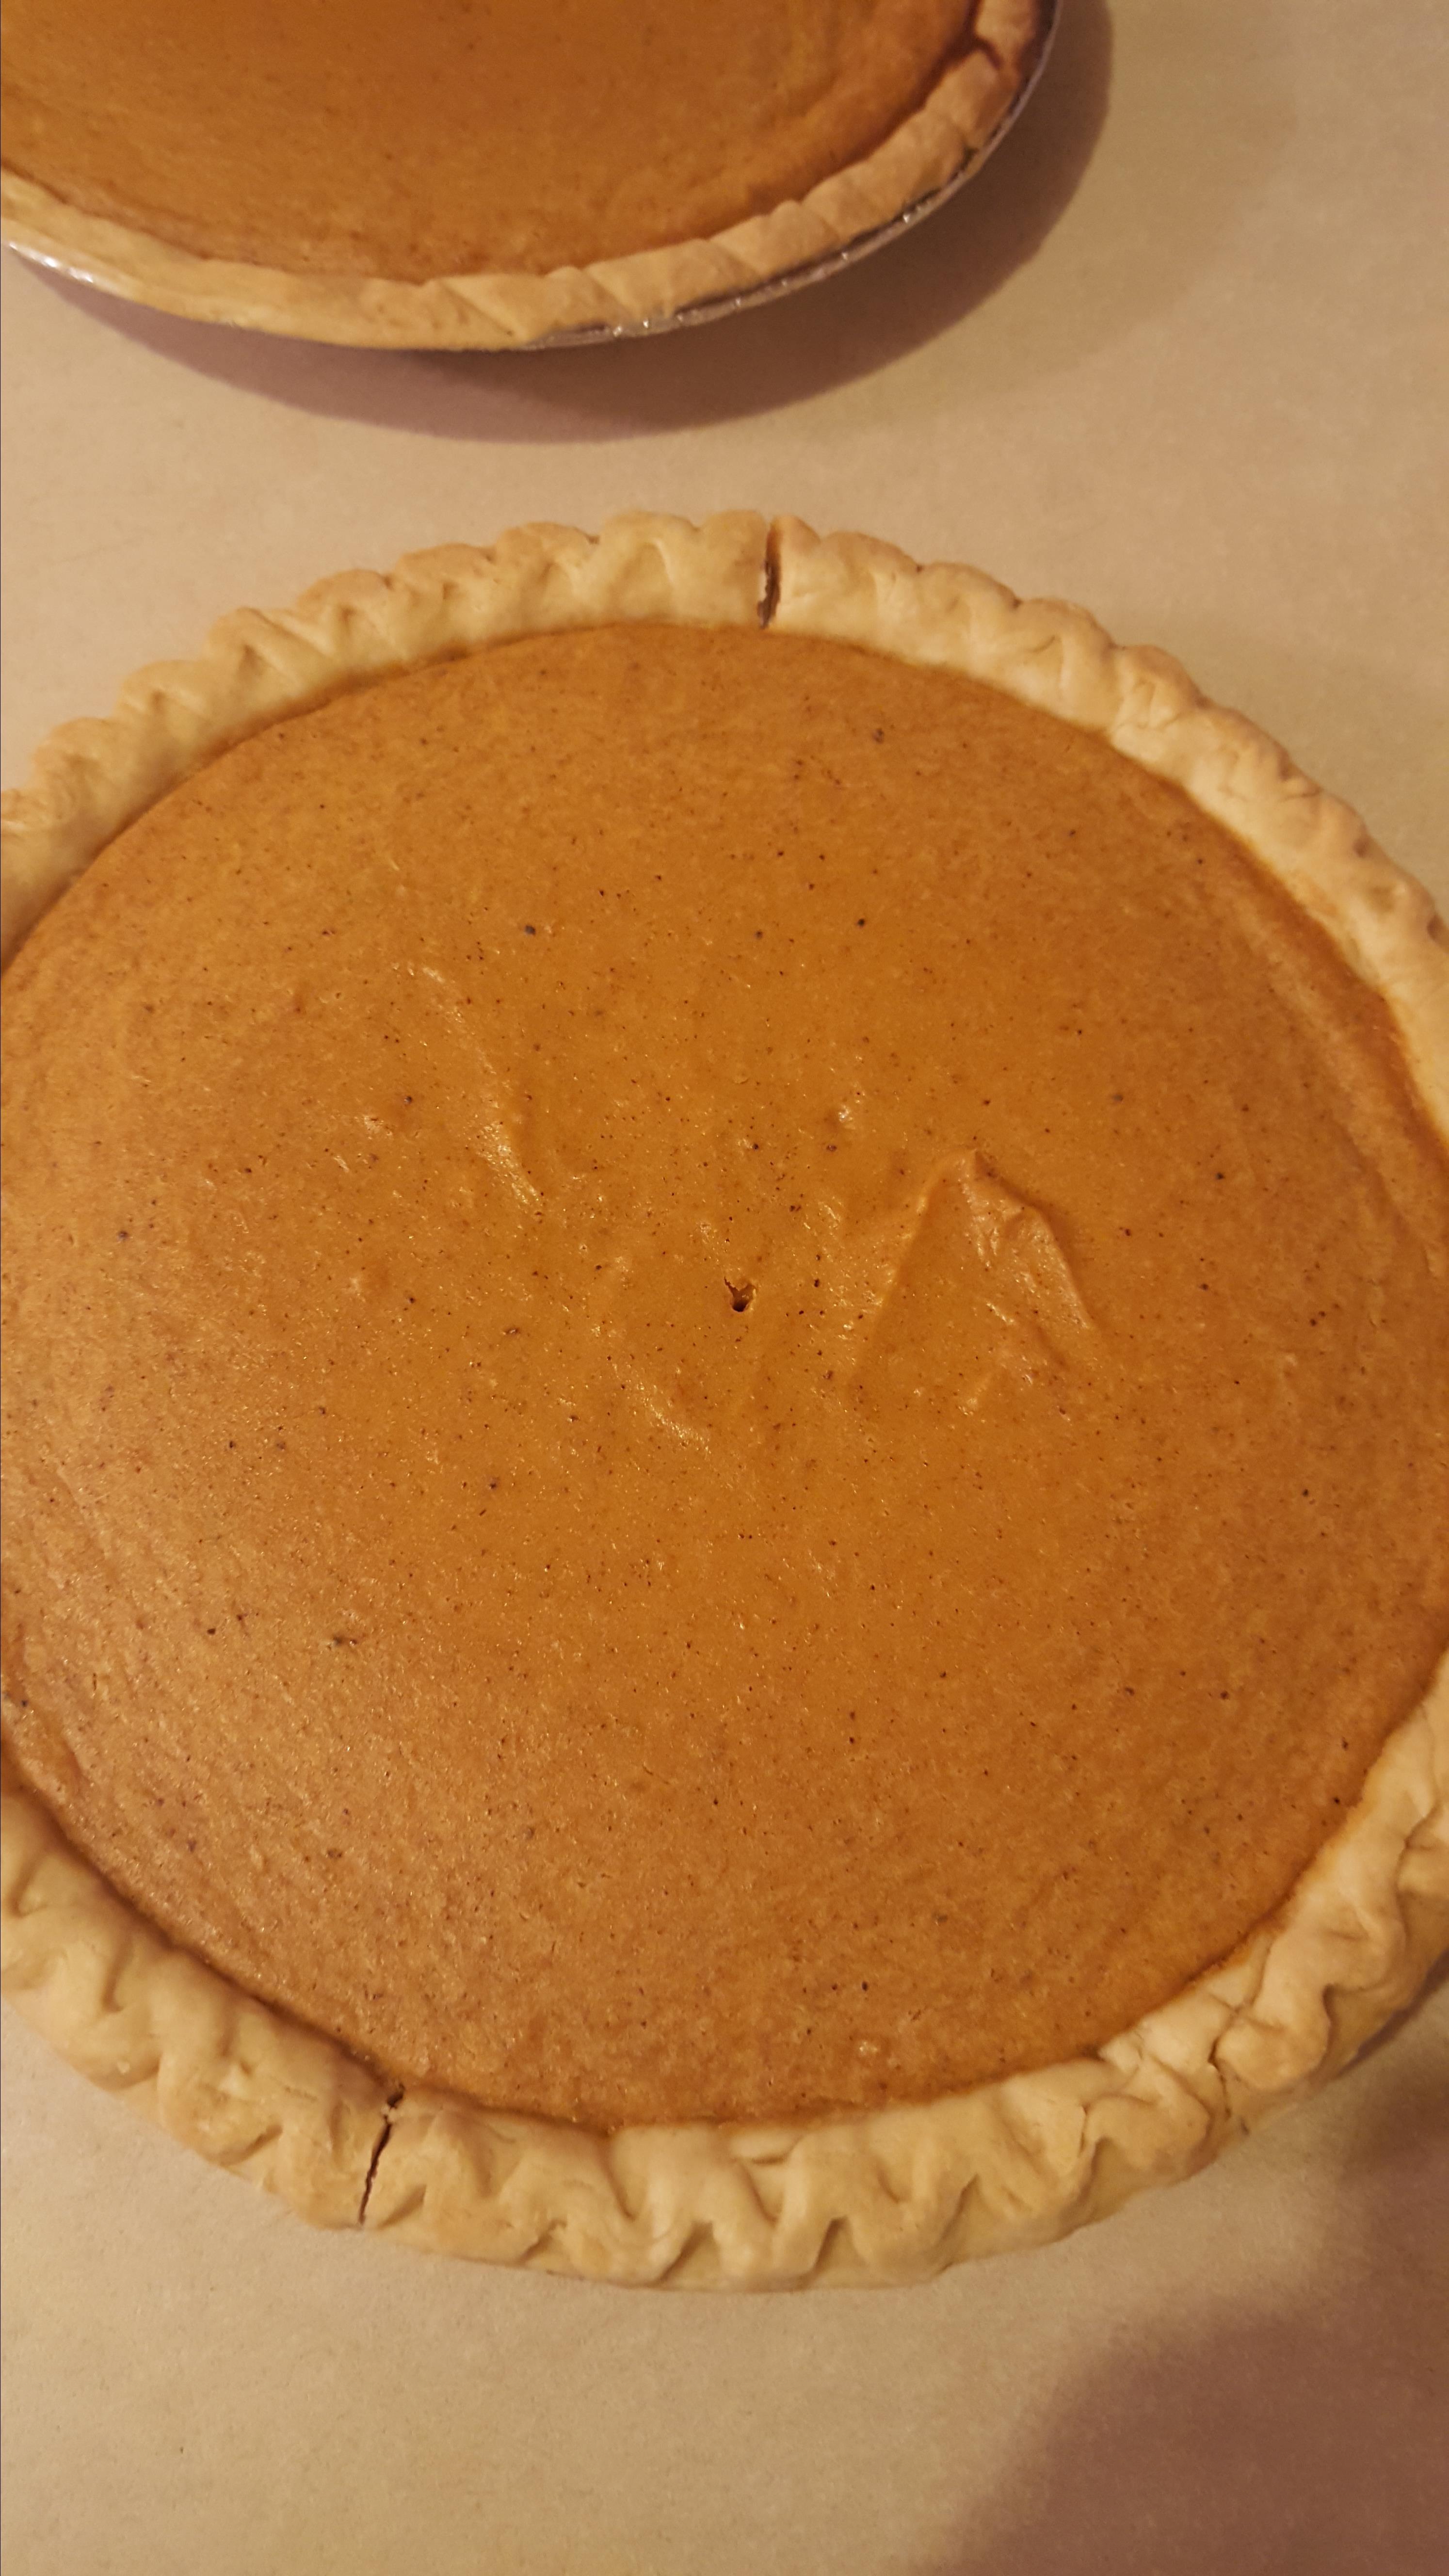 Sweet Potato Pie From Eagle Brand Reg Allrecipes,Sulcata Tortoise Baby